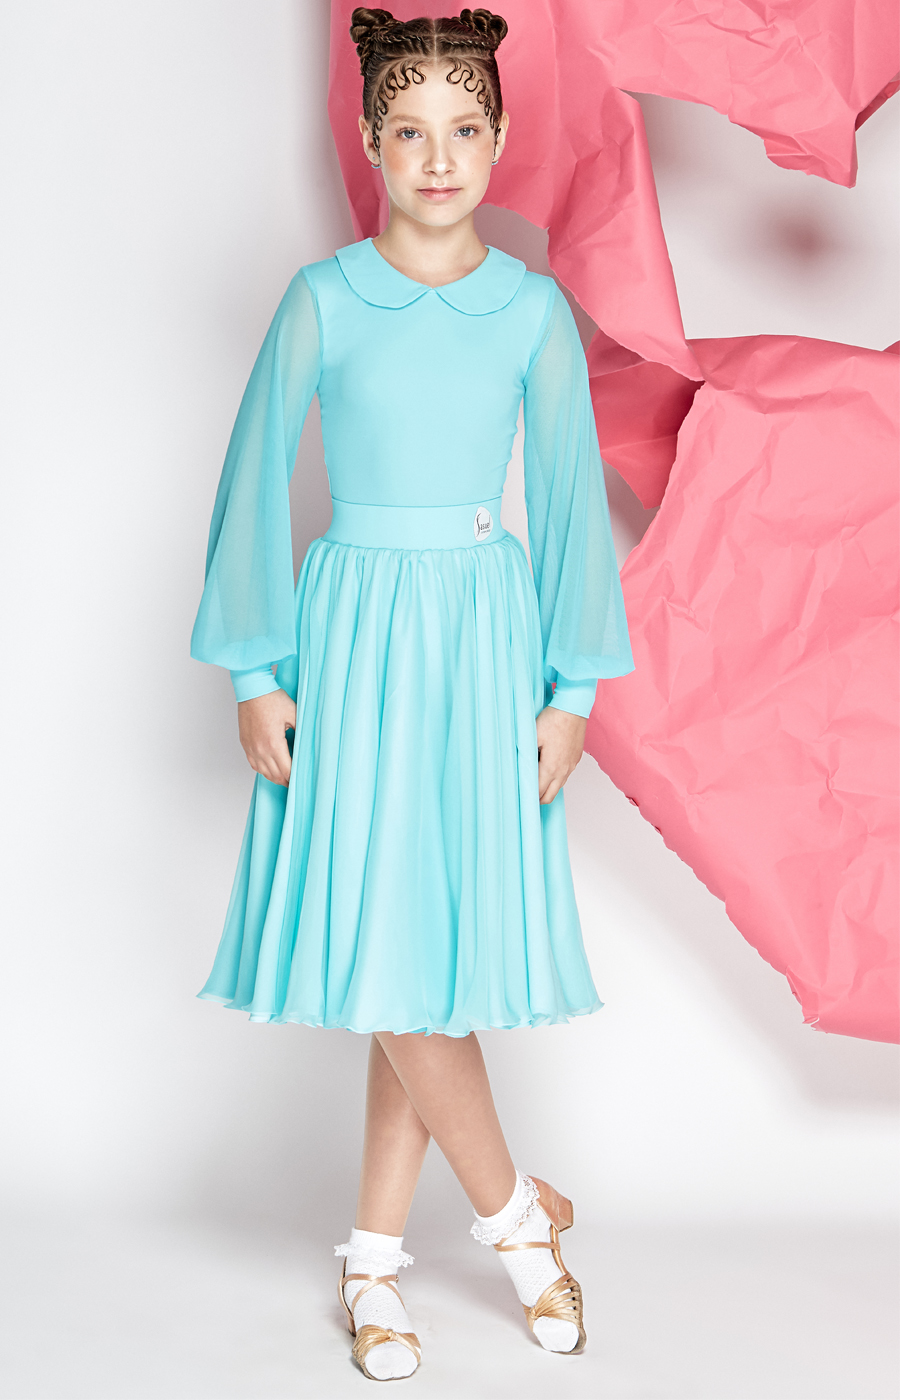 Heidi juvenile dress